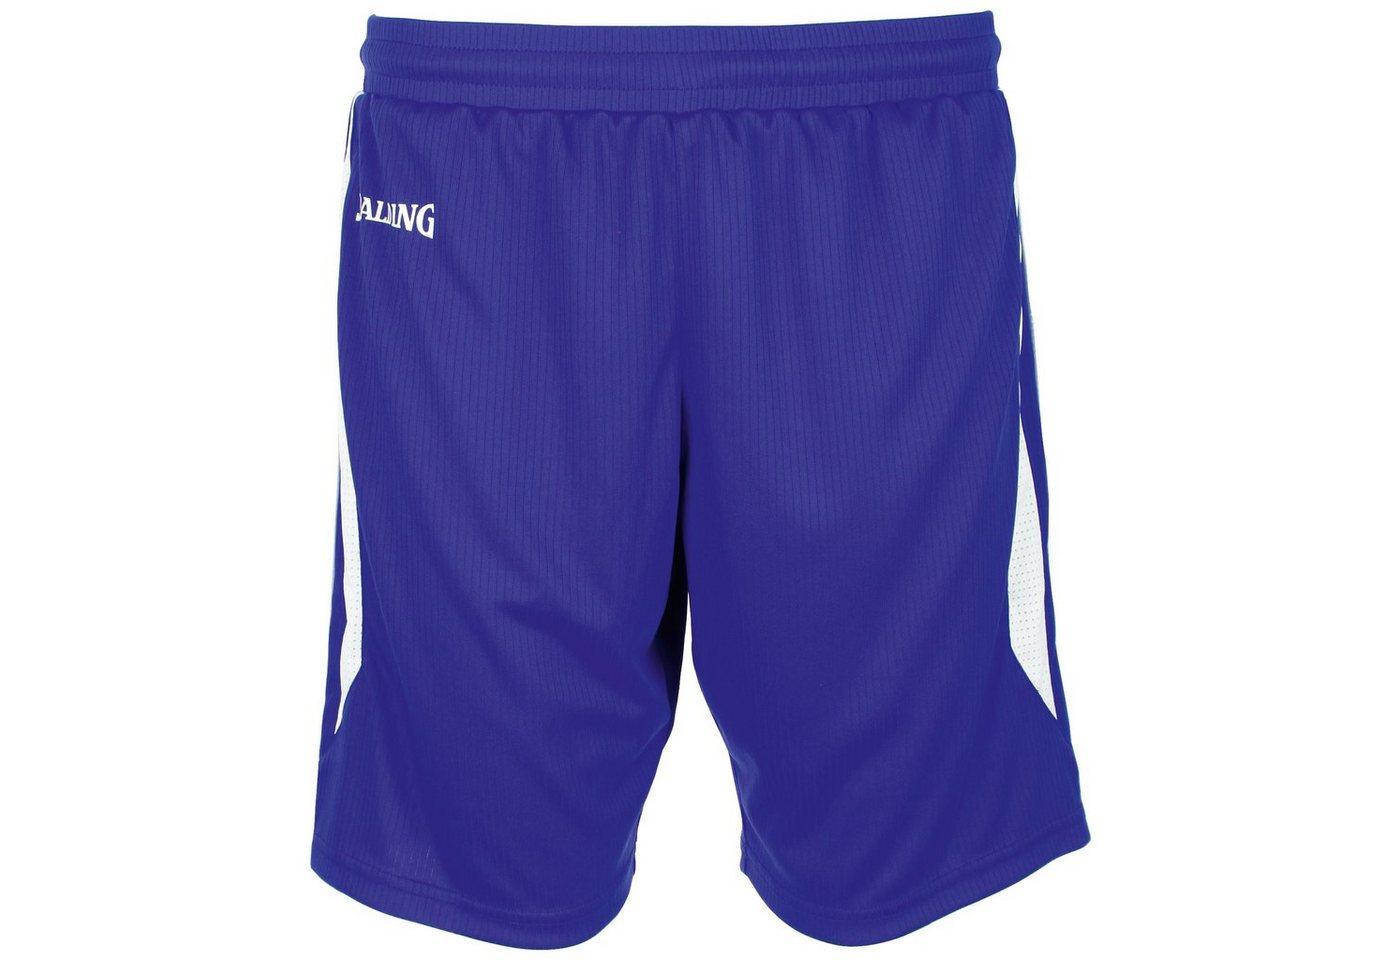 Spalding 4her III Basketballshort Damen | Sportbekleidung > Sporthosen > Basketballshorts | Blau | Spalding